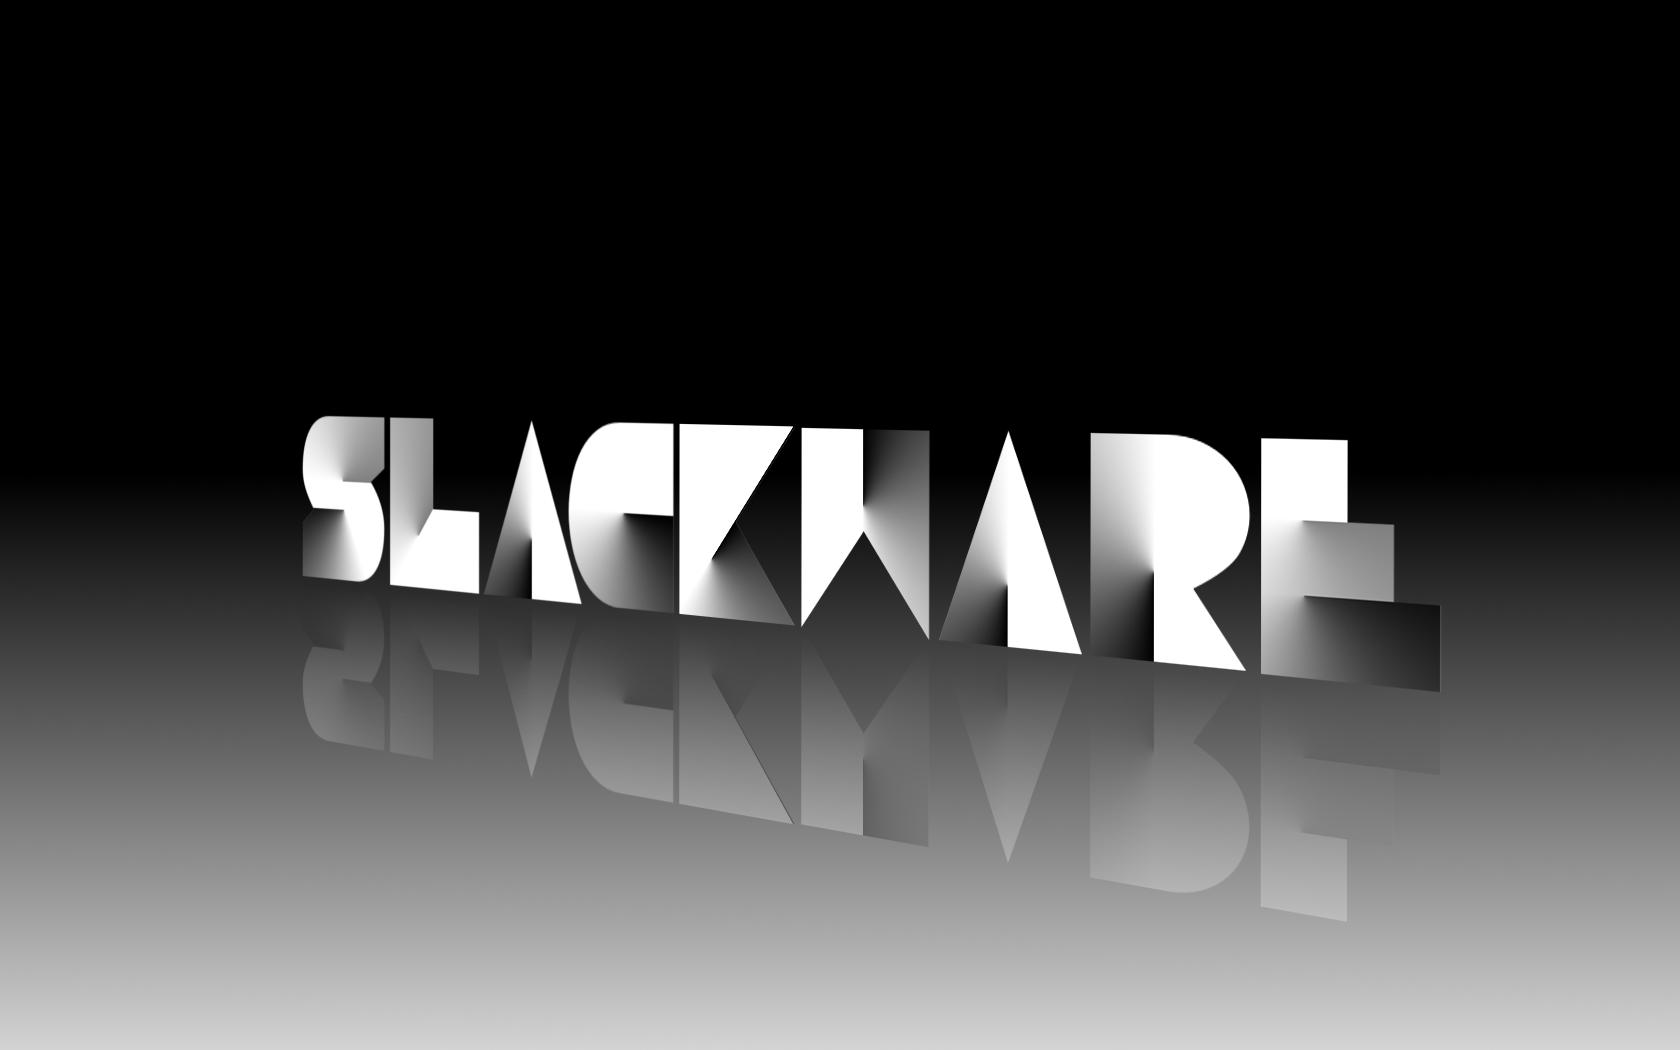 slackware by d413k